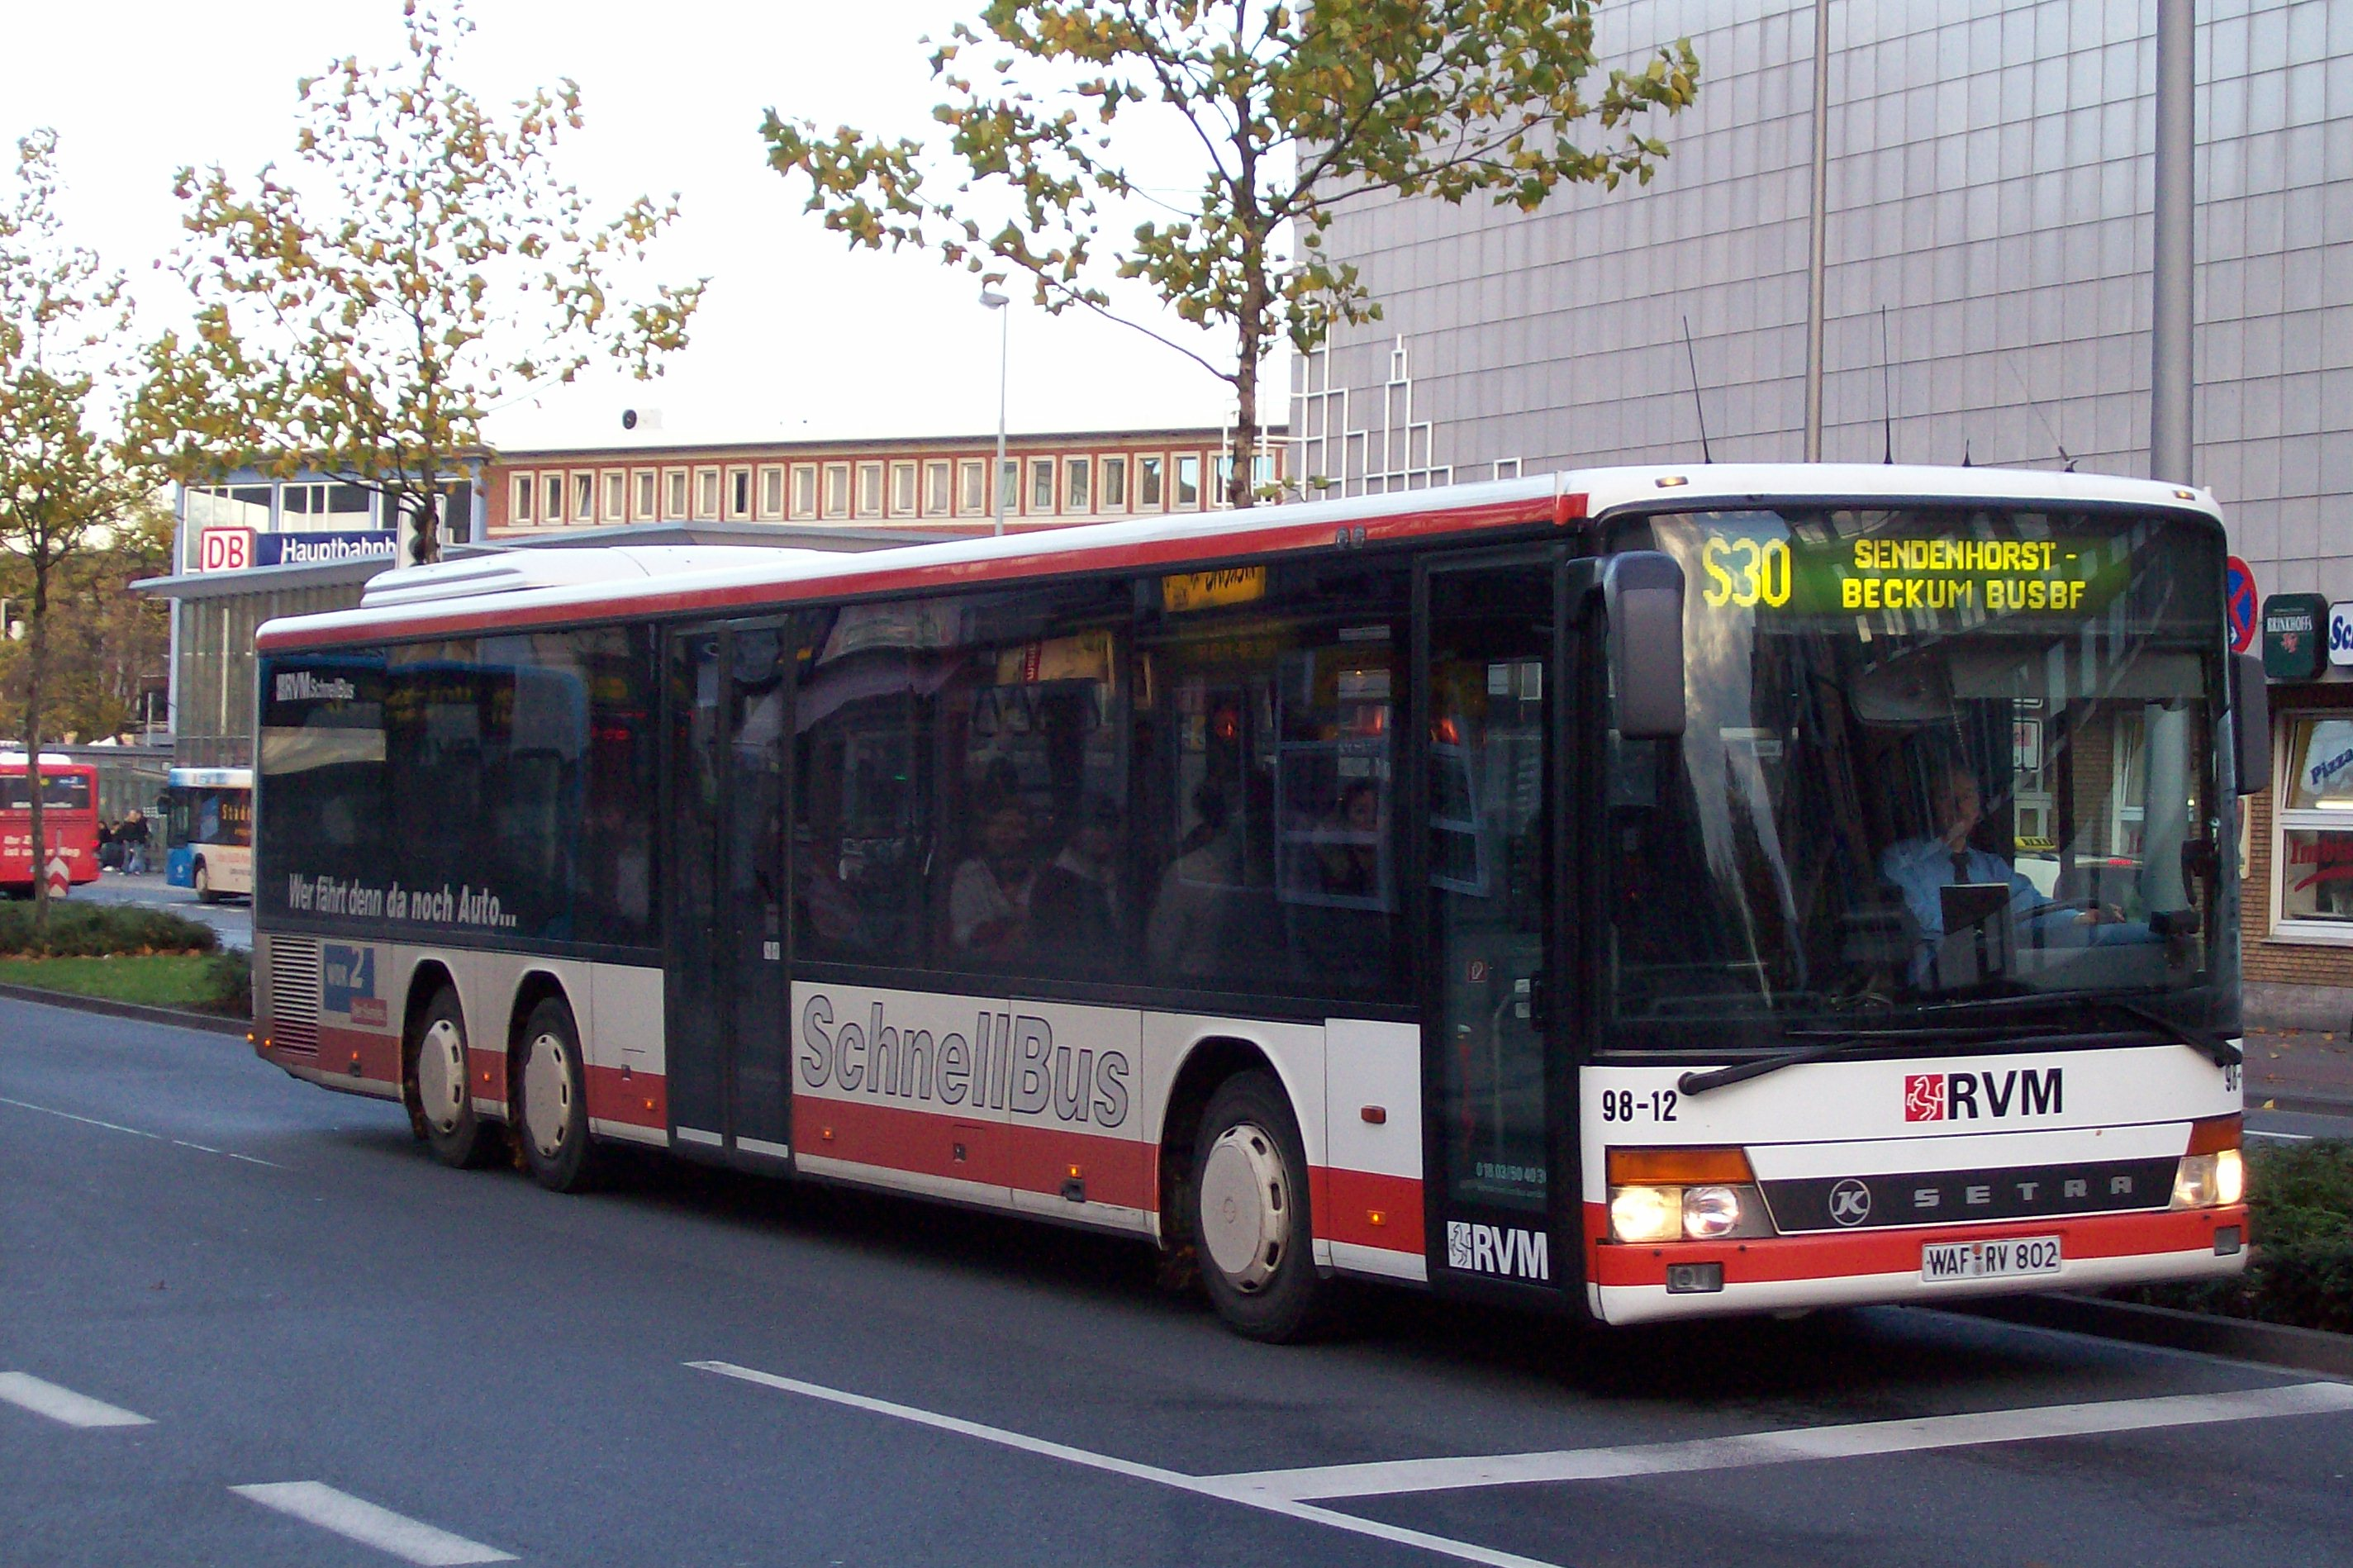 File:100 1426 RVM 98-12 Hauptbahnhof.jpg